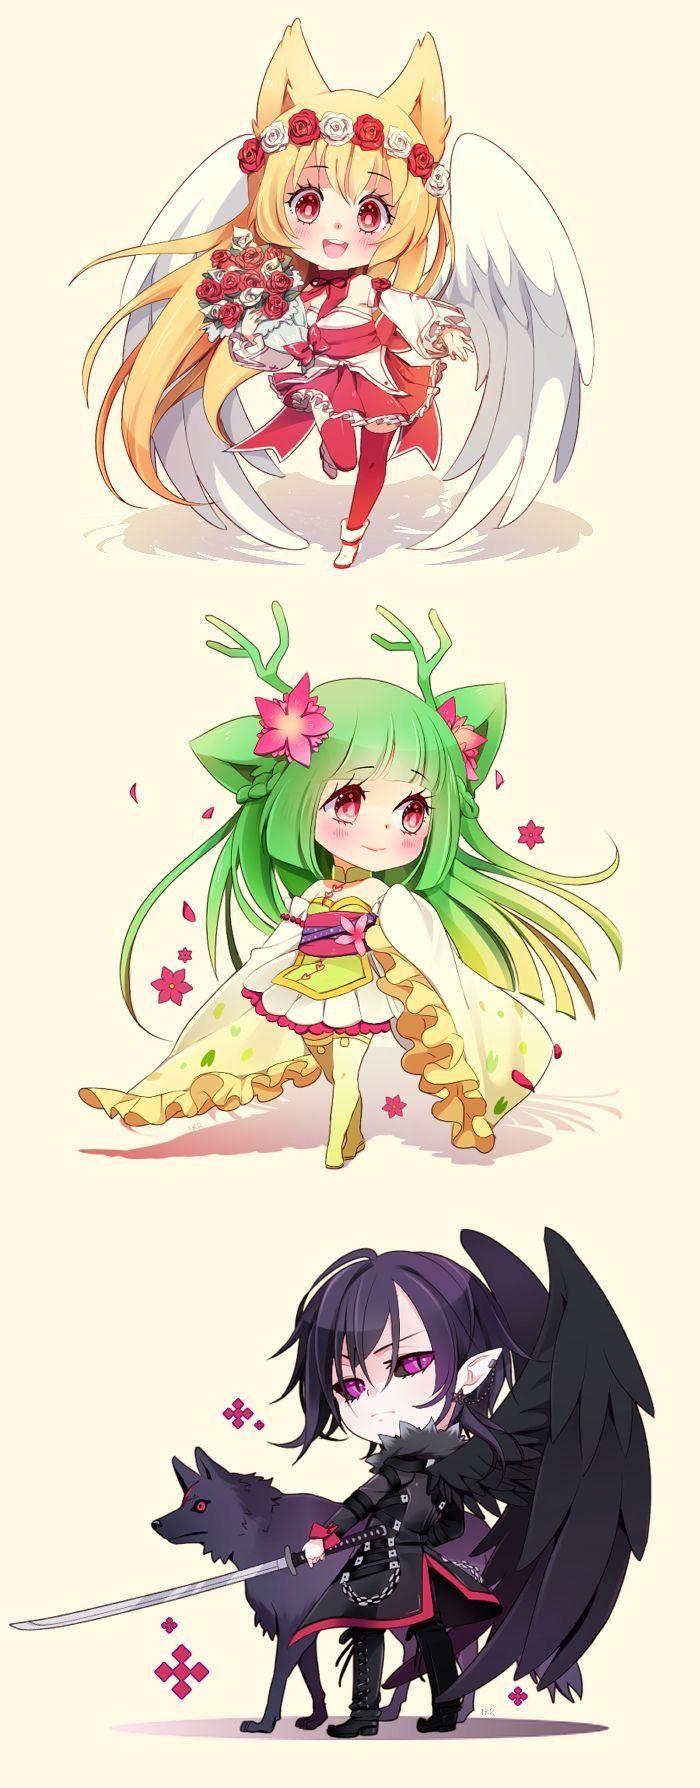 Pin de Rinneyuuki em ANIME ️ imagens) Anime kawaii